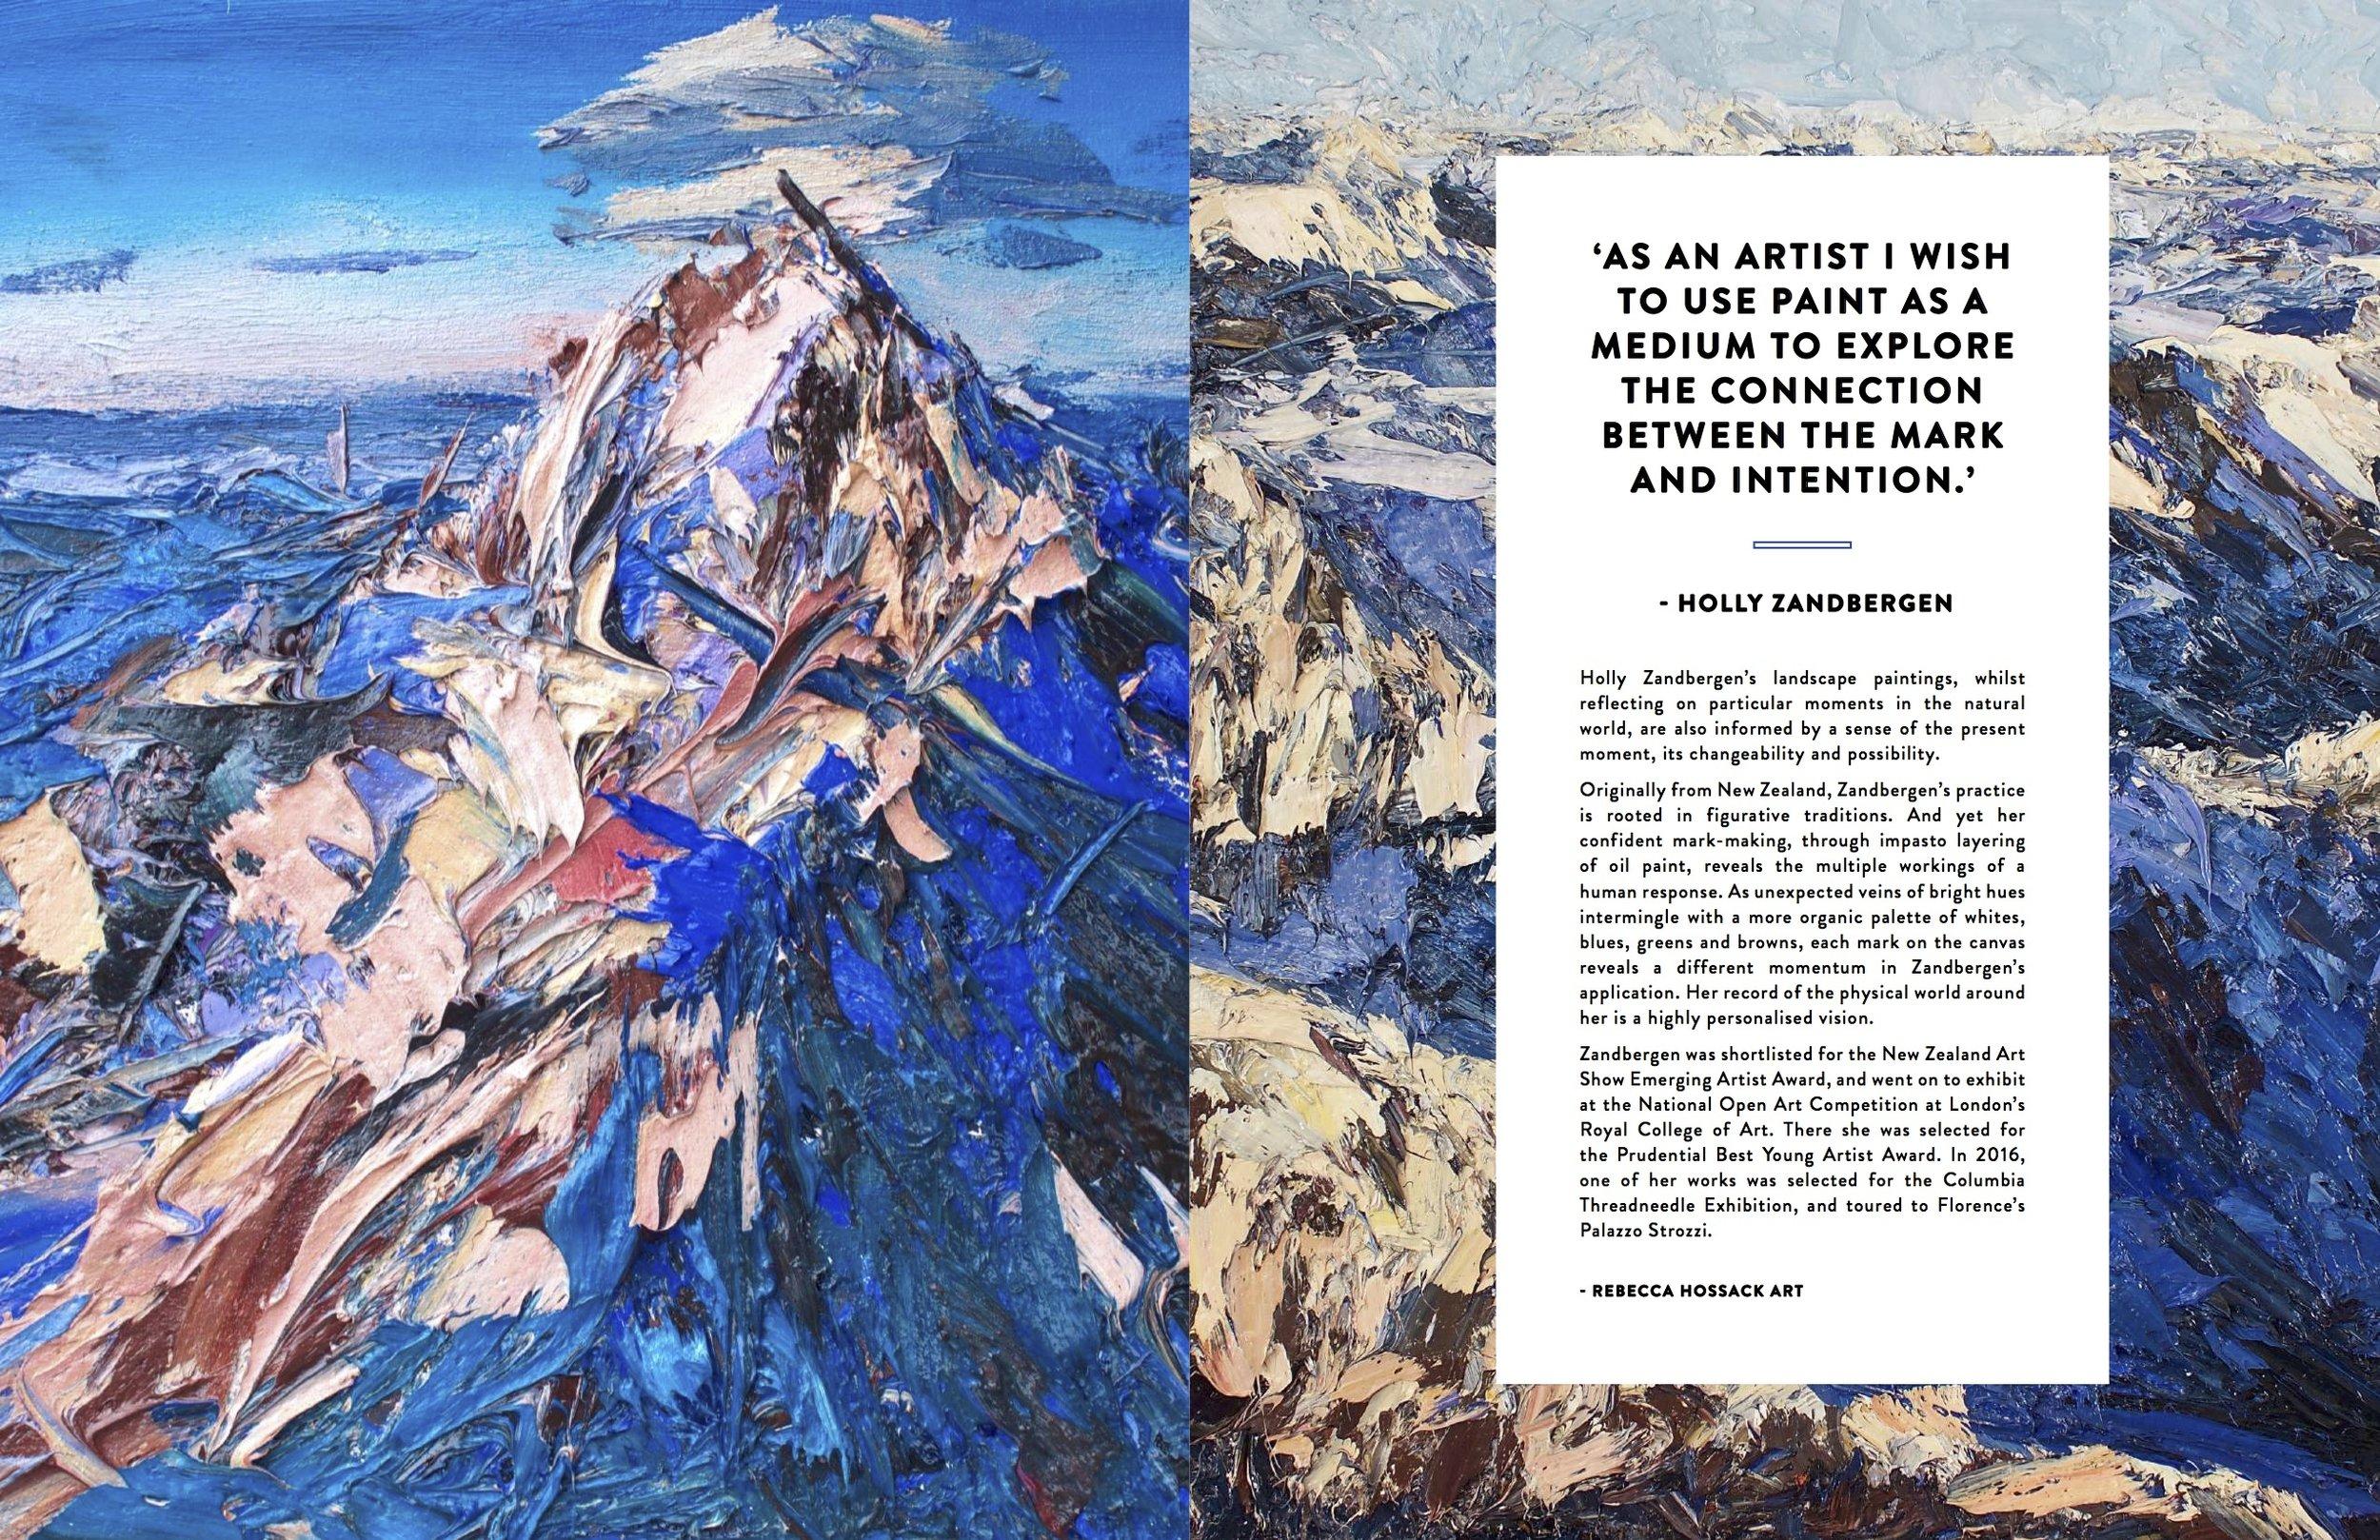 rebecca-hossack-art-gallery-holly-zandbergen-feature-in-create-magazine.jpg